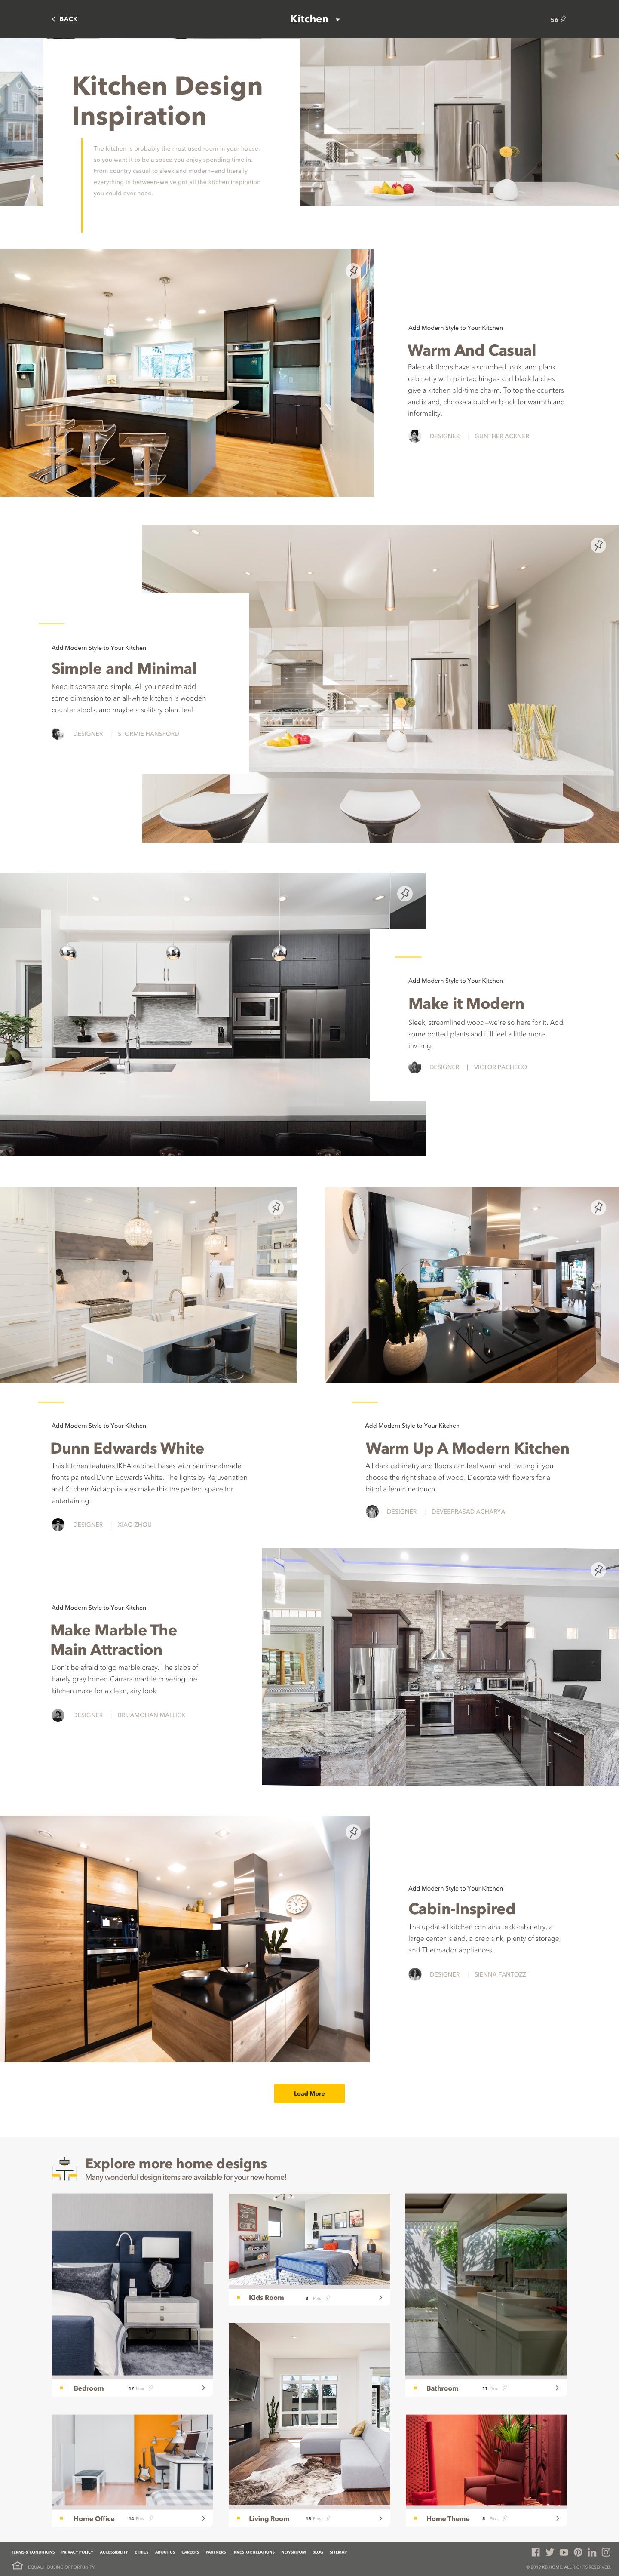 Lookbook-Kitchen.jpg